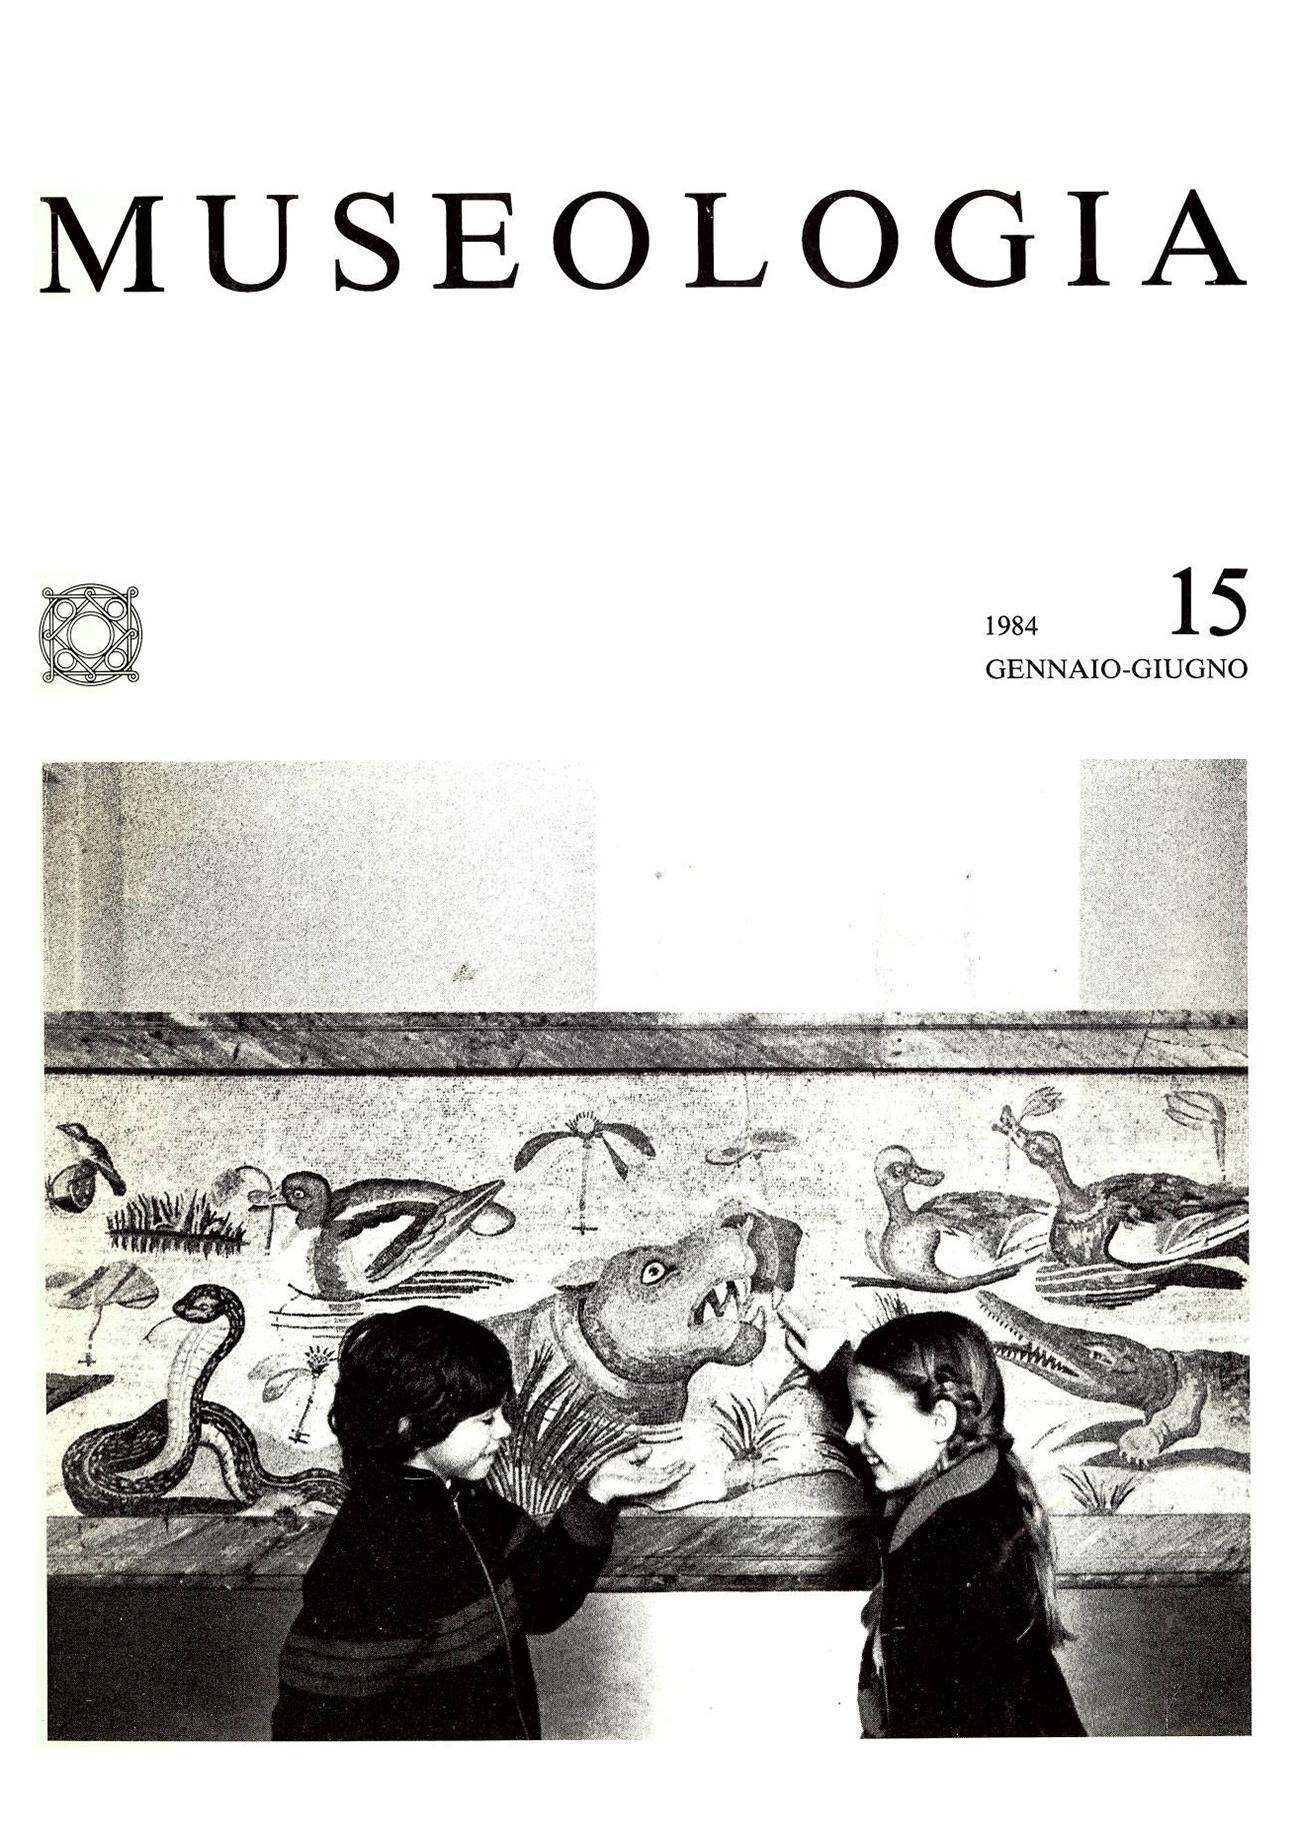 Museologia n°15, Gennaio-Giugno 1984